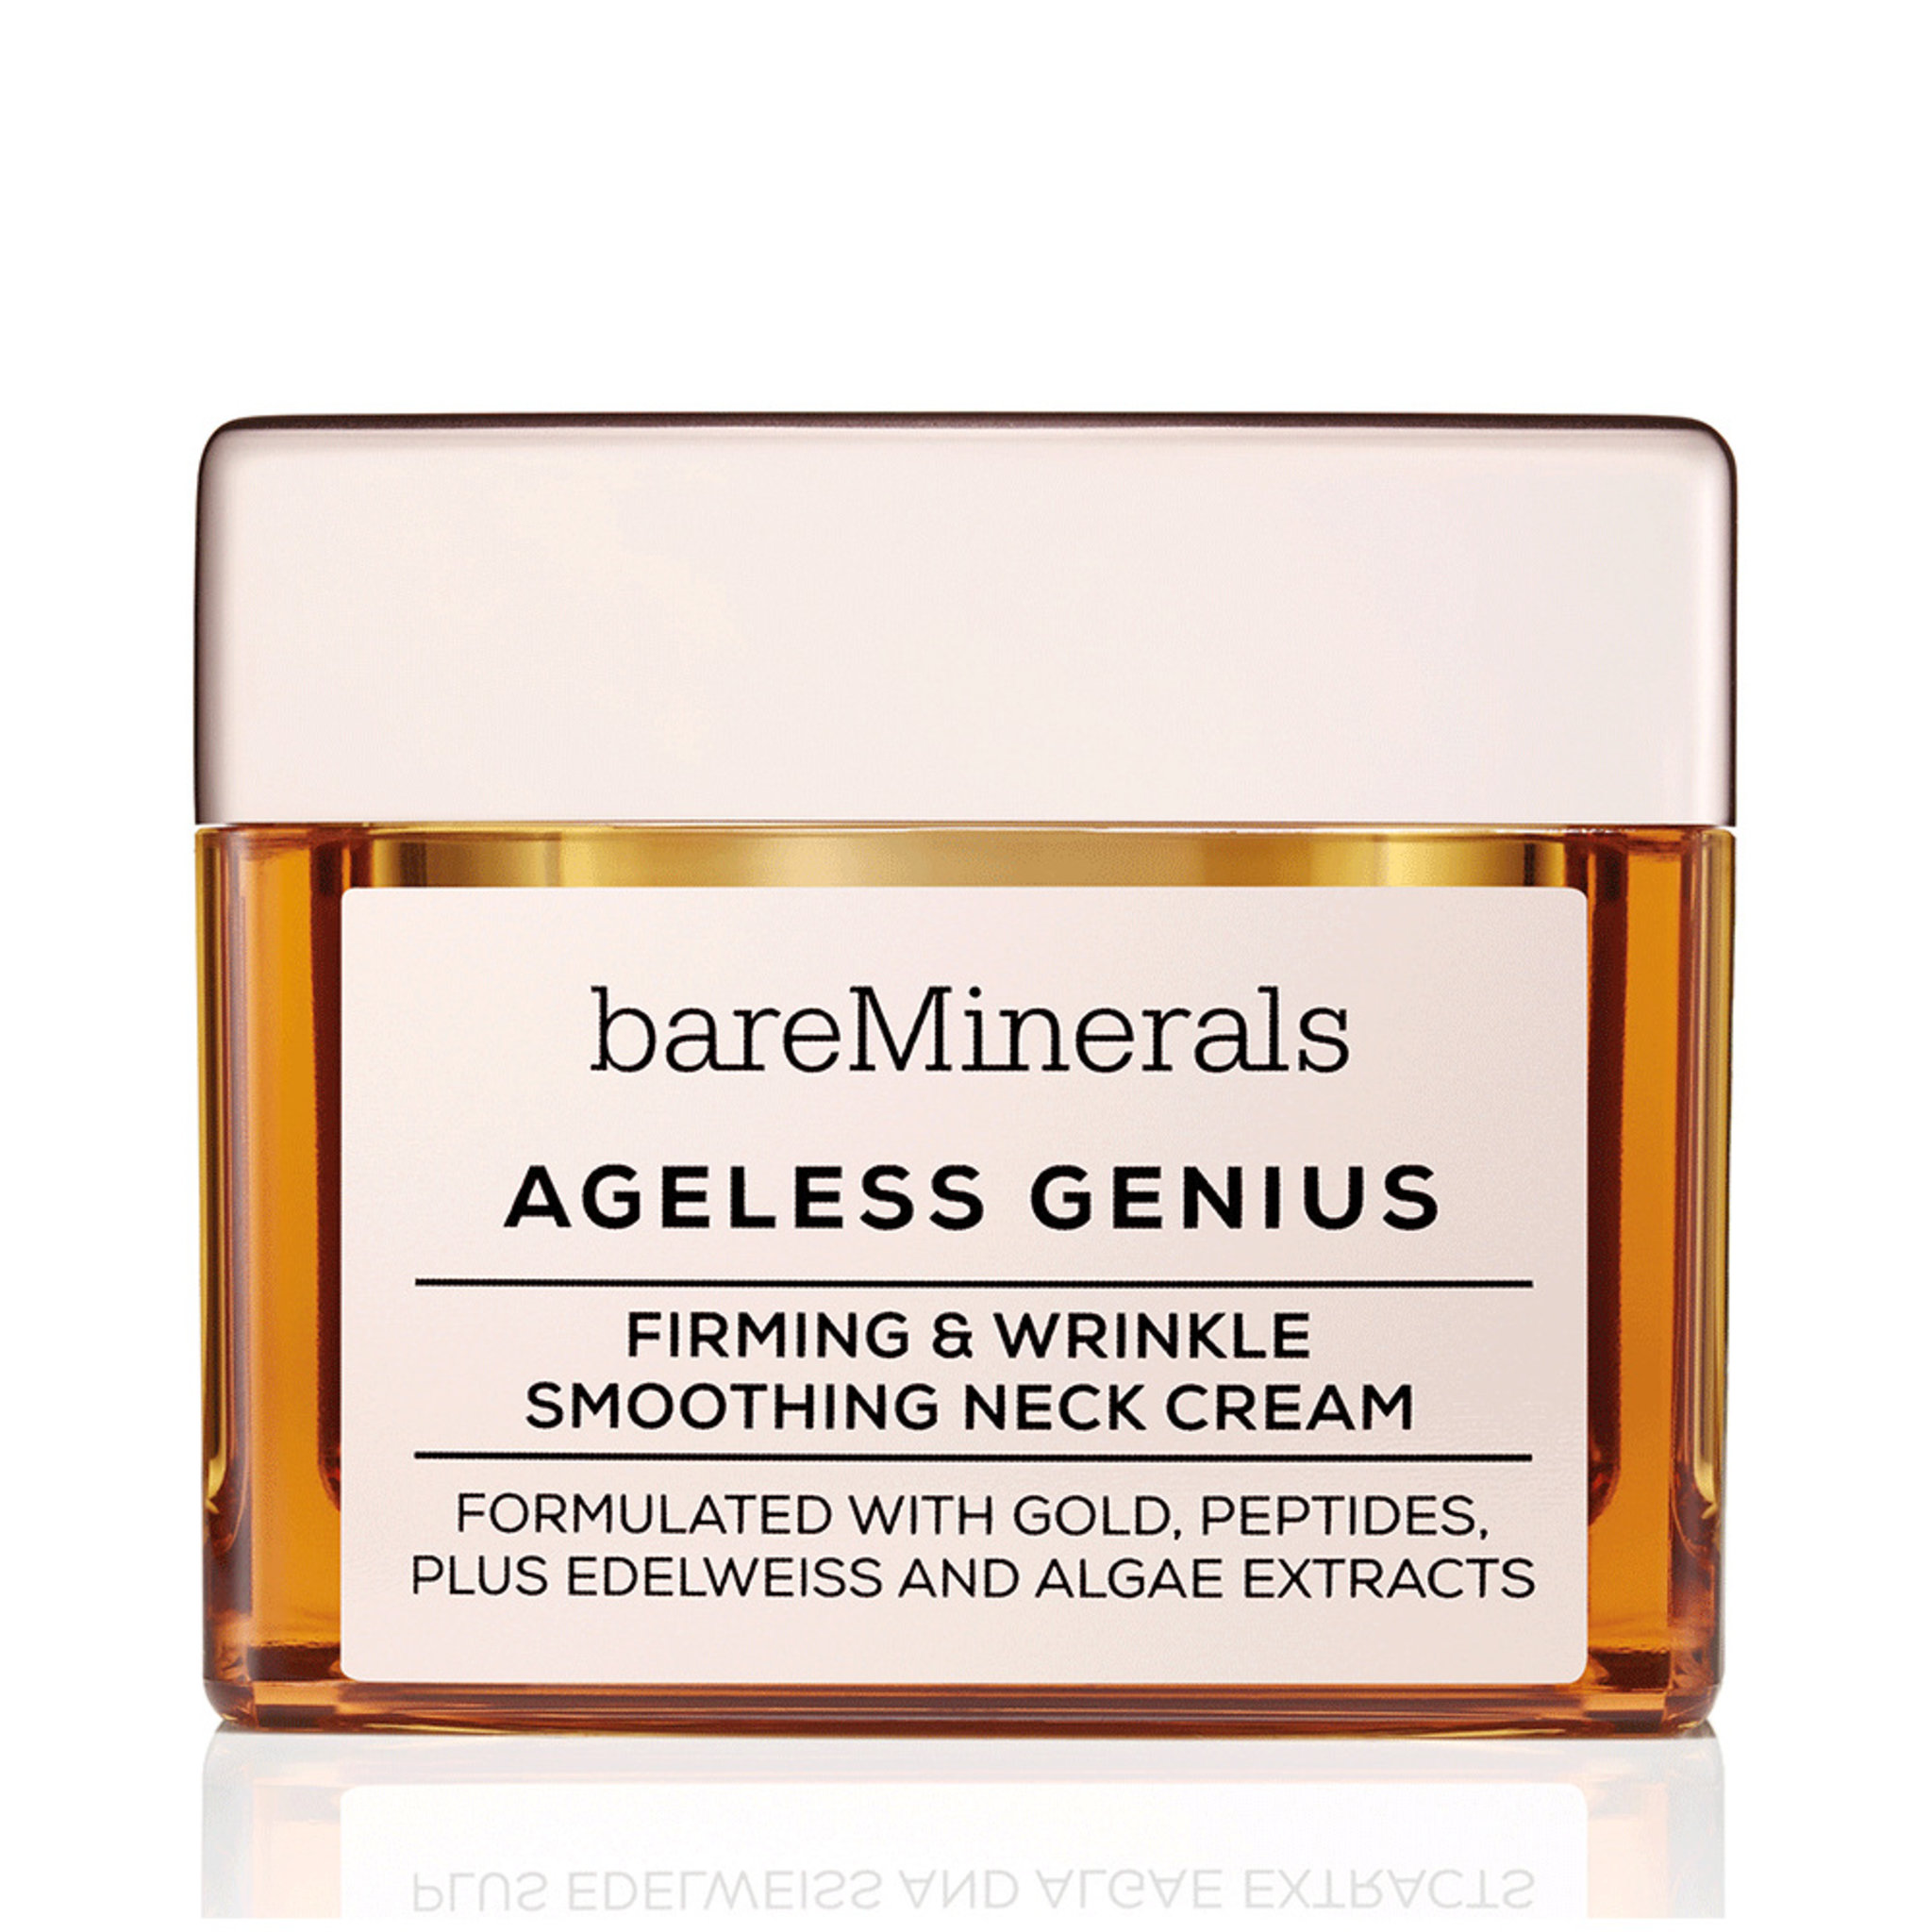 Ageless Genius™ Firming & Wrinkle Smoothing Neck Cream 50g